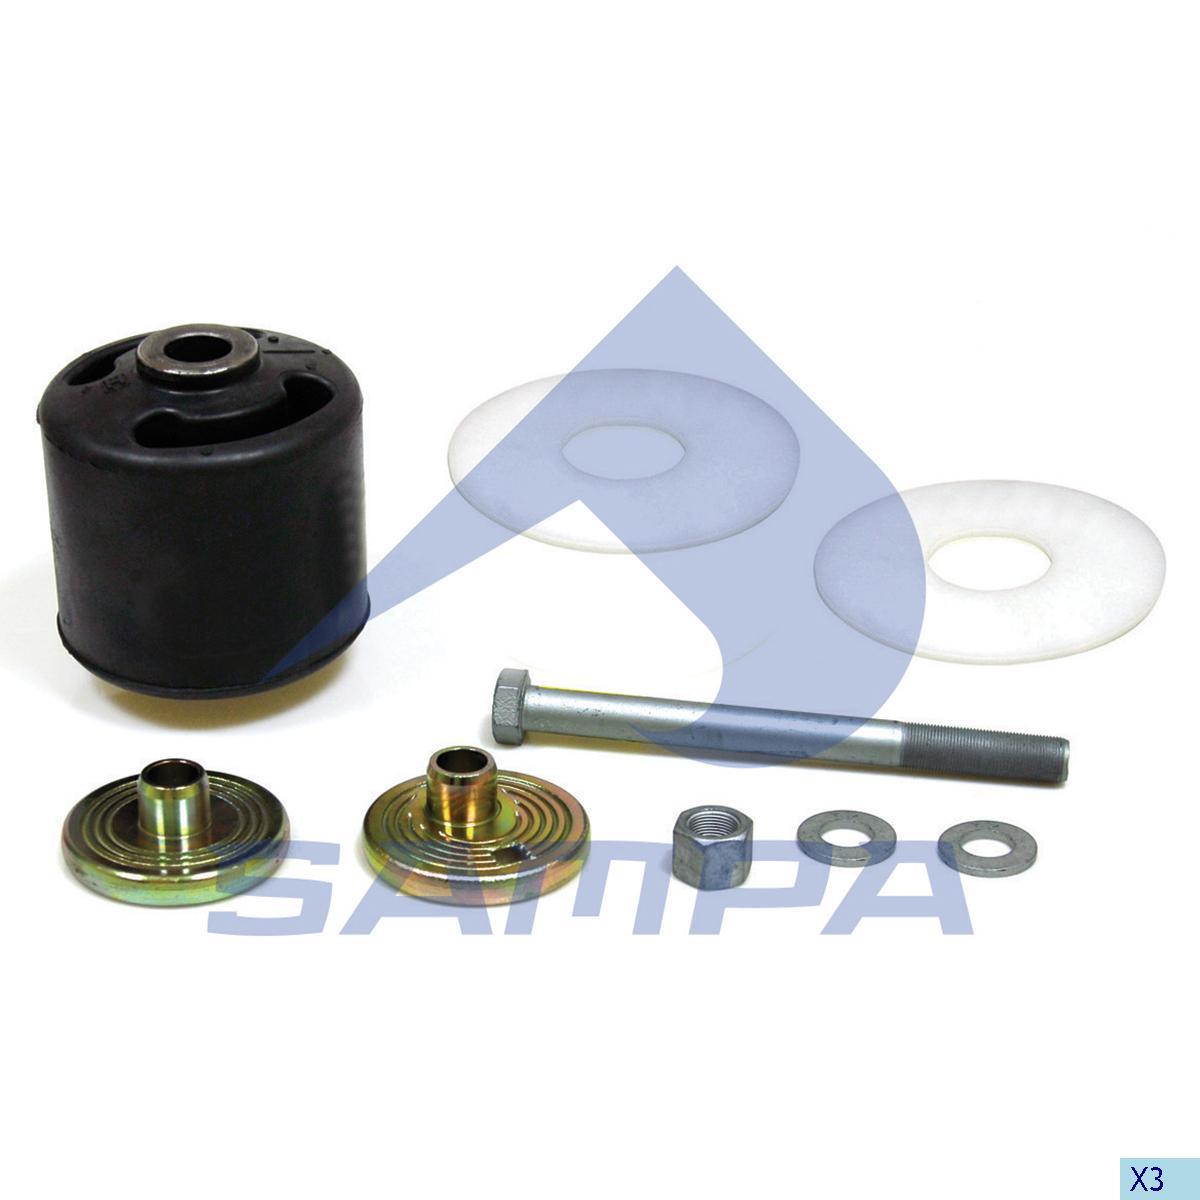 Repair Kit, Balance Arm Axle, Sauer Achsen, Power Unit